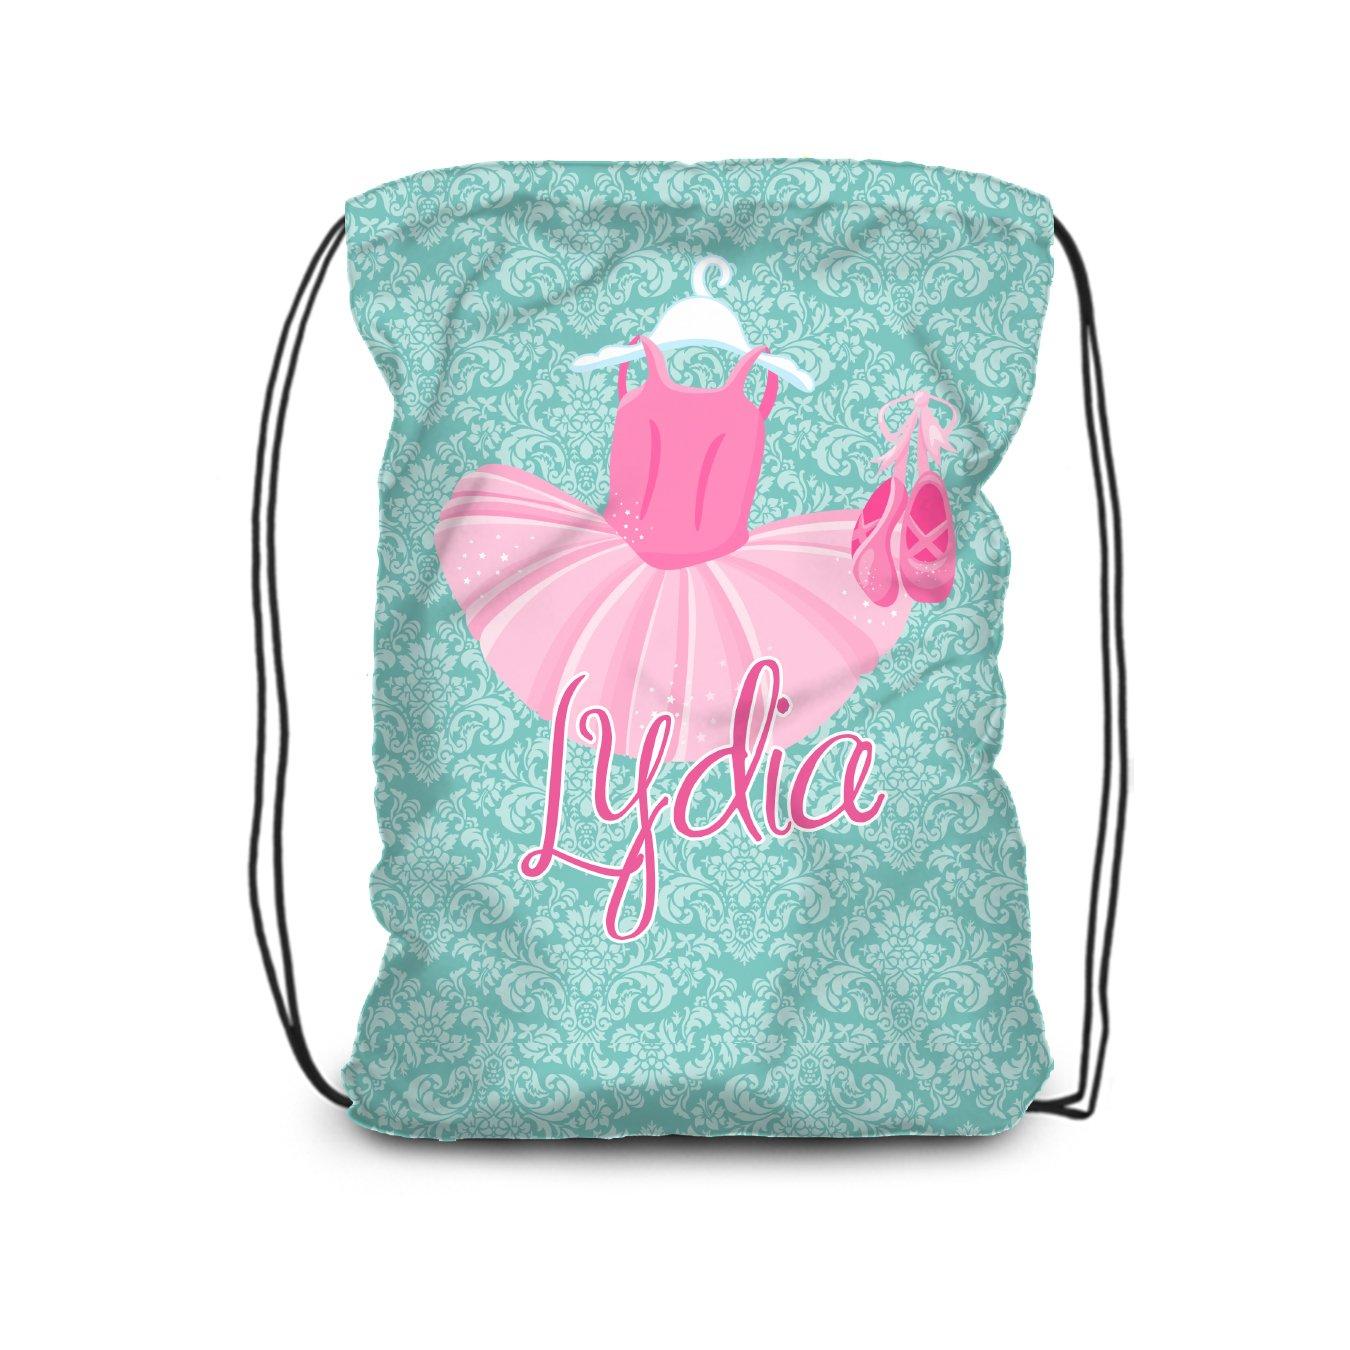 Ballet Drawstring Backpack - Turquoise Tutu Ballerina Bag